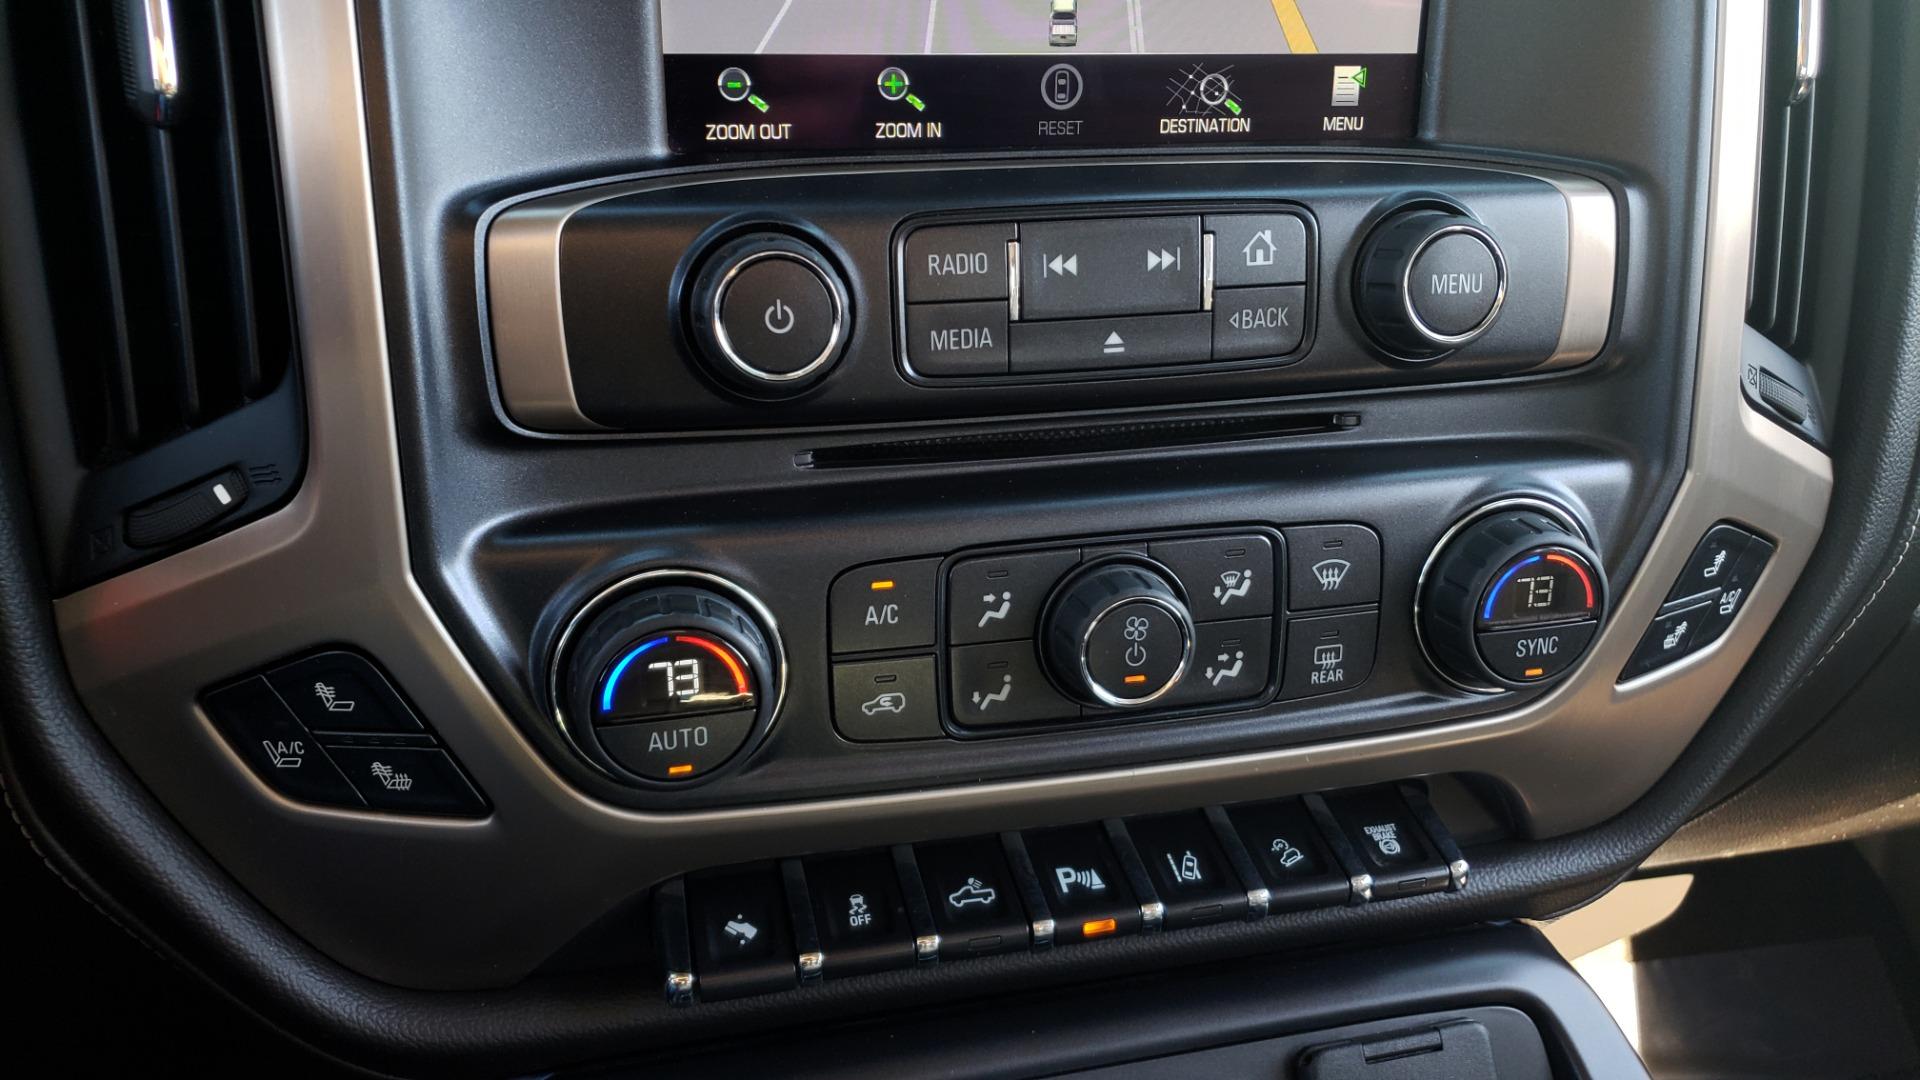 Used 2015 GMC SIERRA 2500HD DENALI 4WD CREWCAB / 6.6L DURAMAX / 6-SPD AUTO / NAV / BOSE for sale $50,995 at Formula Imports in Charlotte NC 28227 57